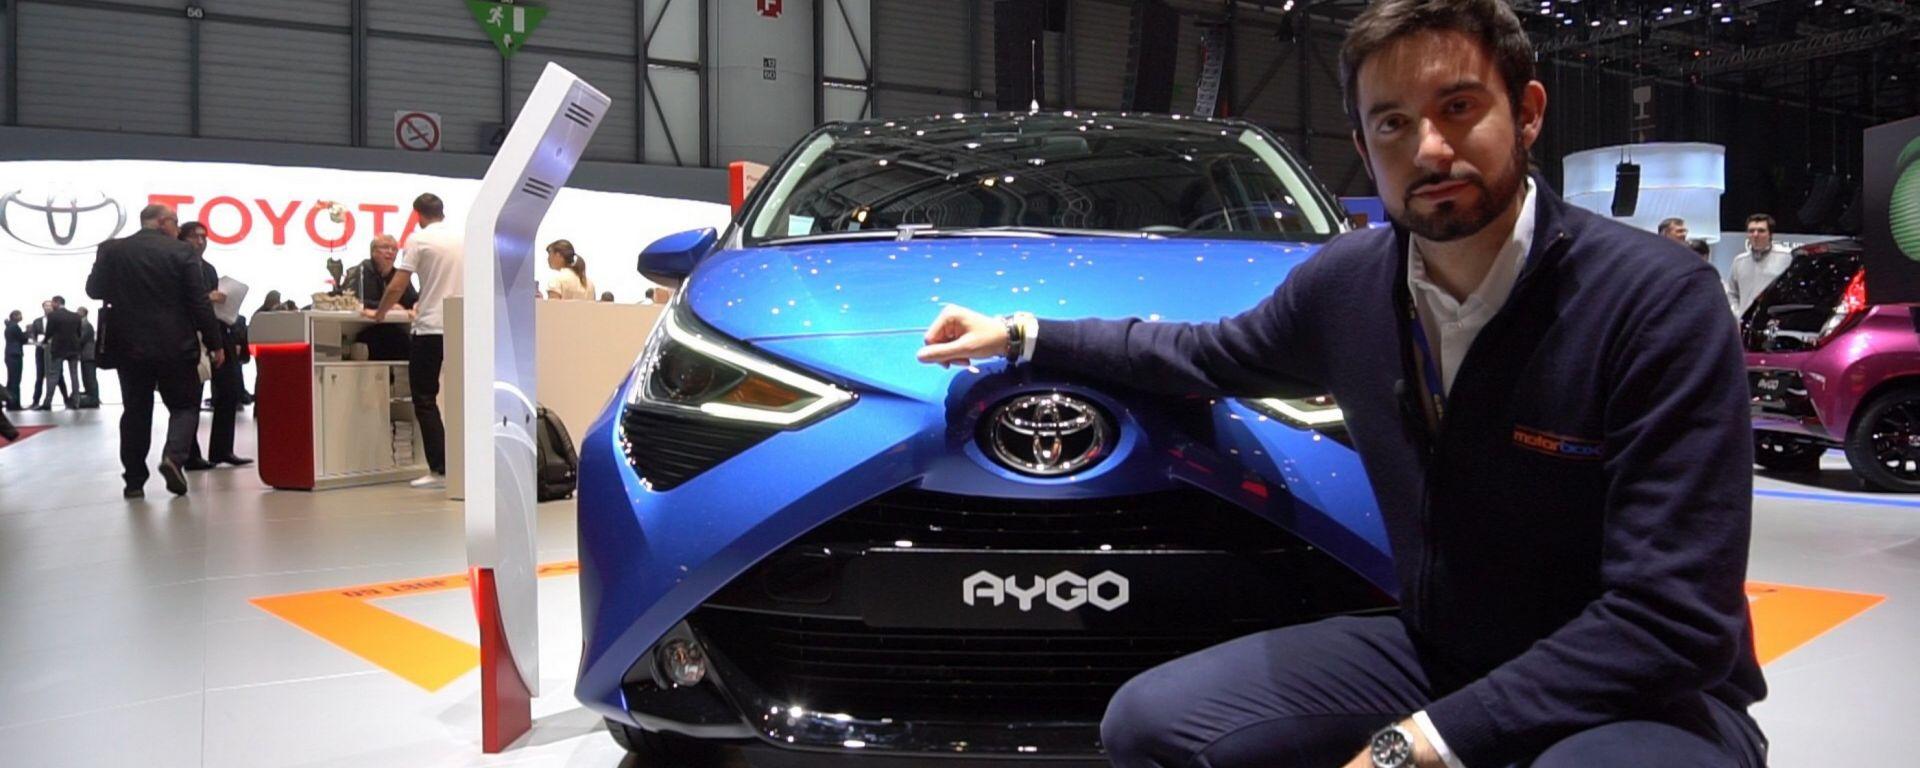 Nuova Toyota Aygo: in video dal Salone di Ginevra 2018